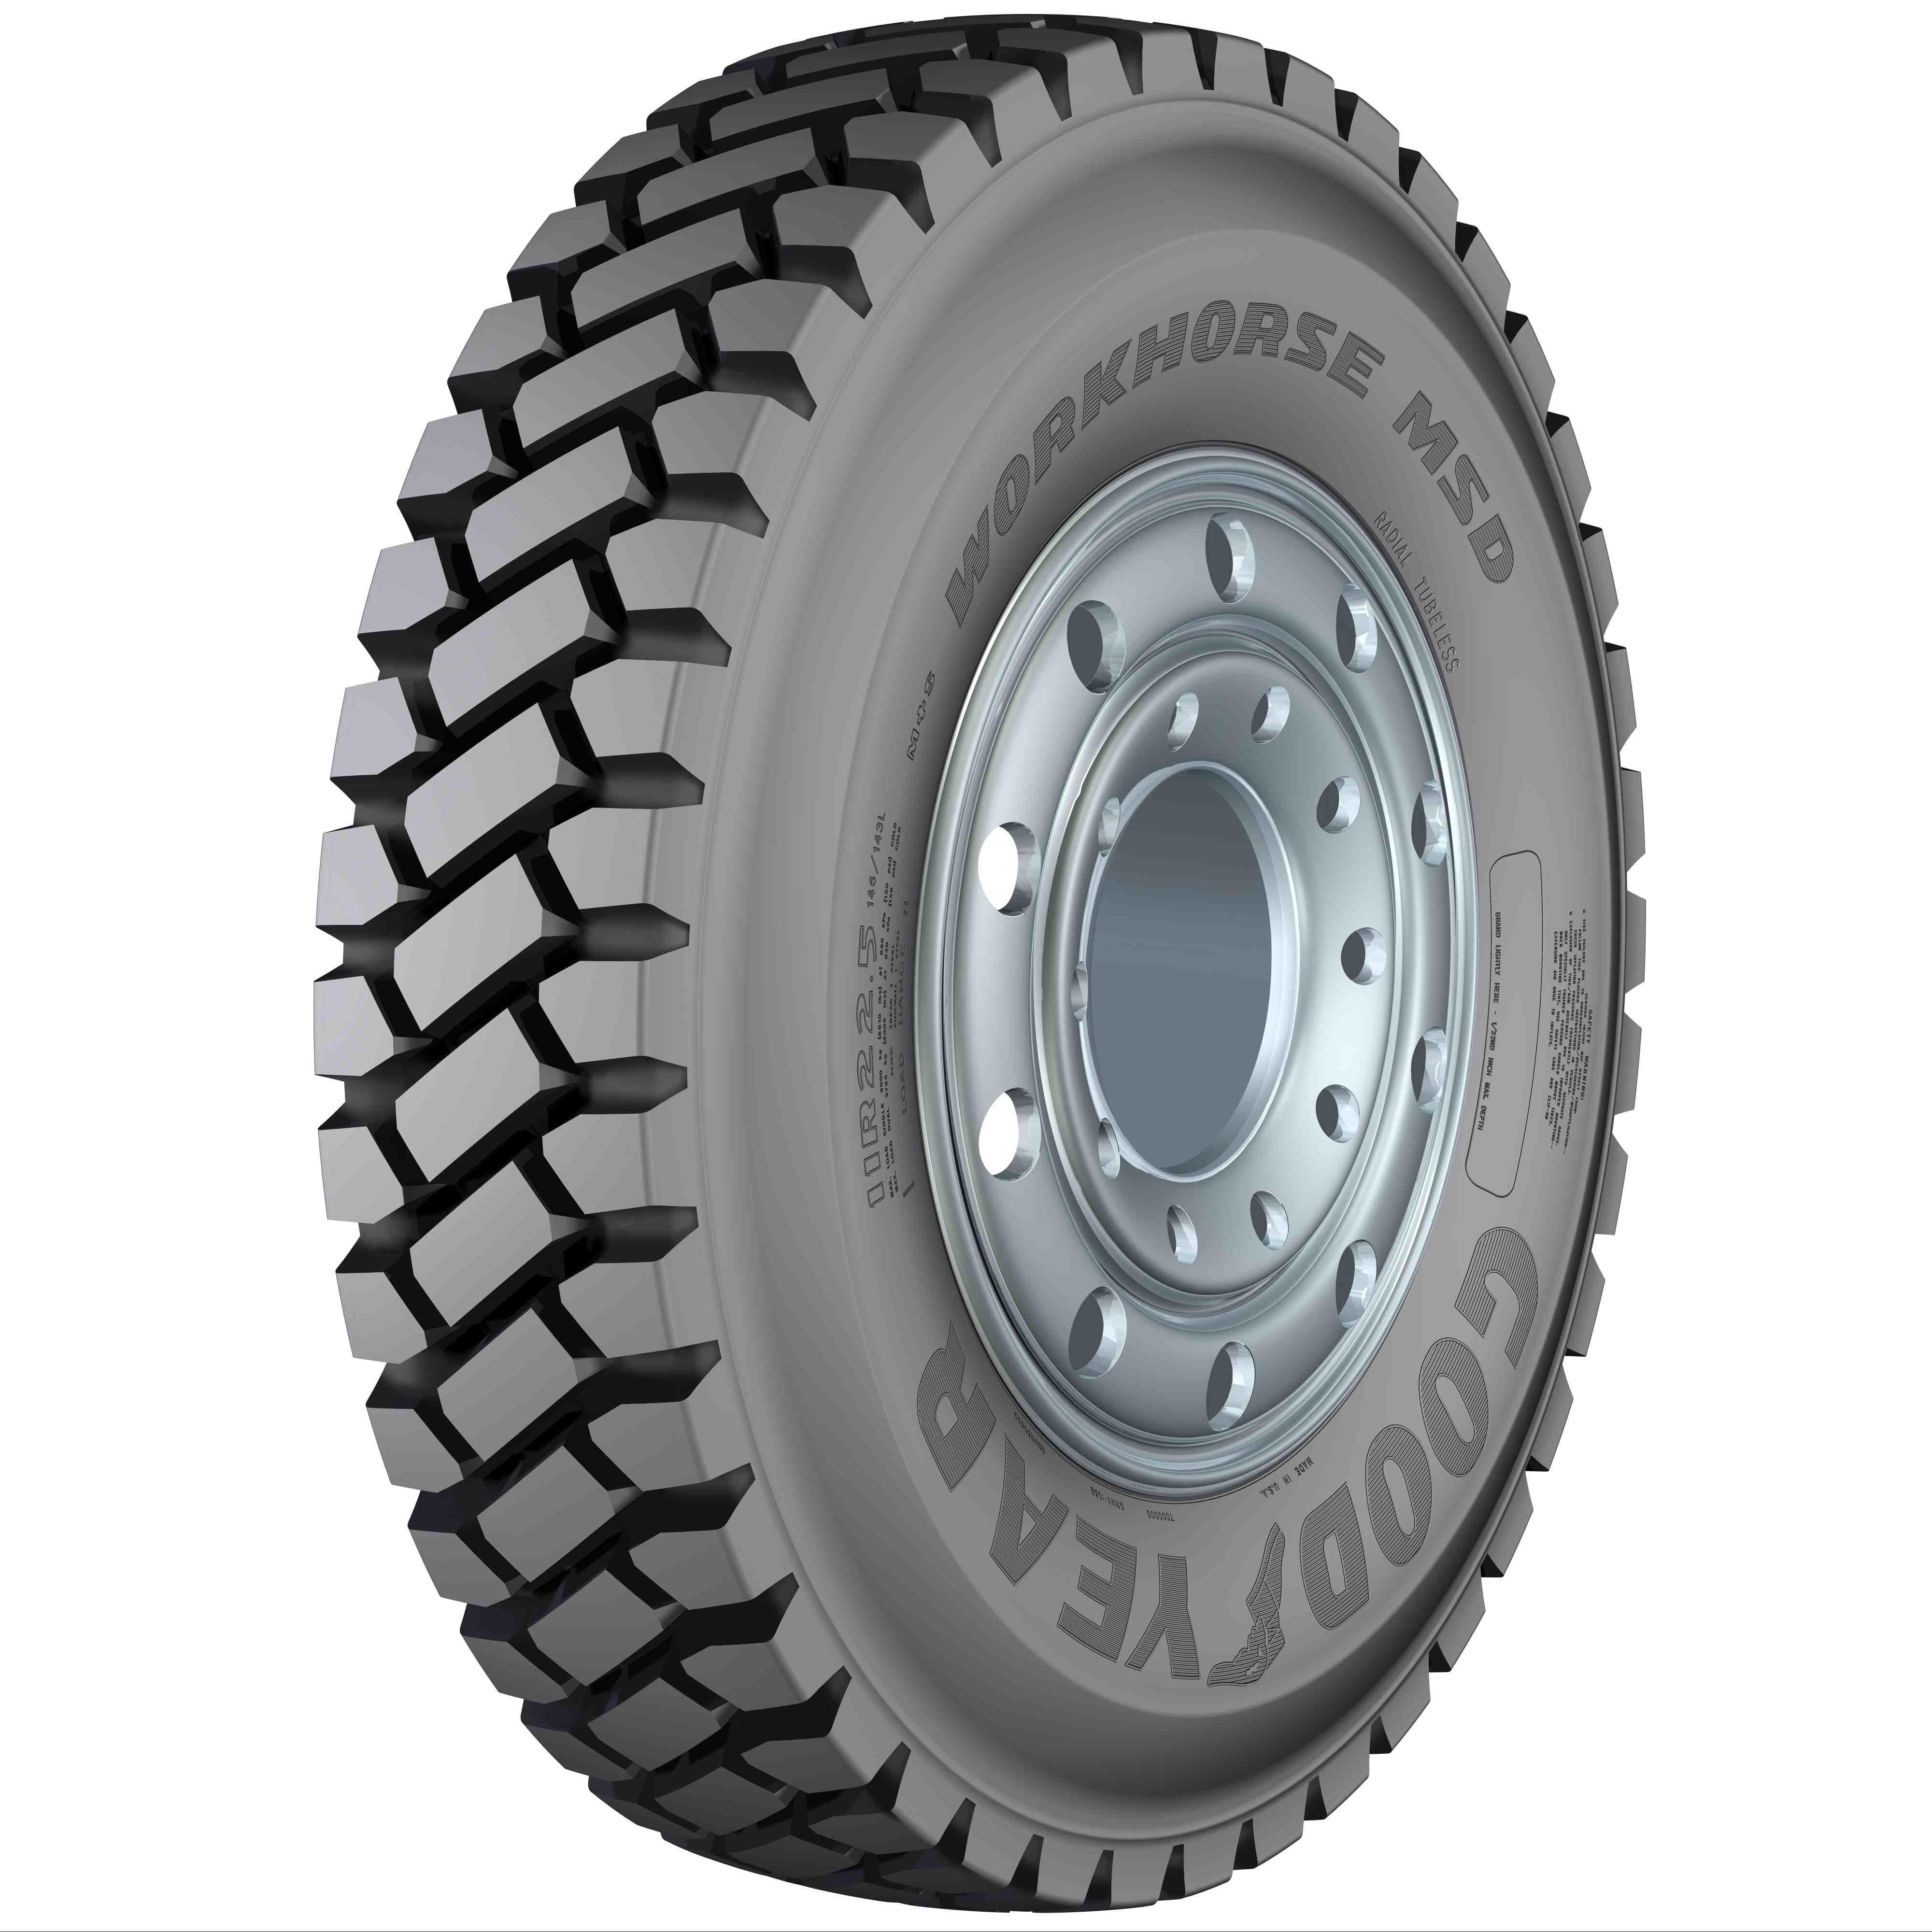 Goodyear Workhorse MSD Tire